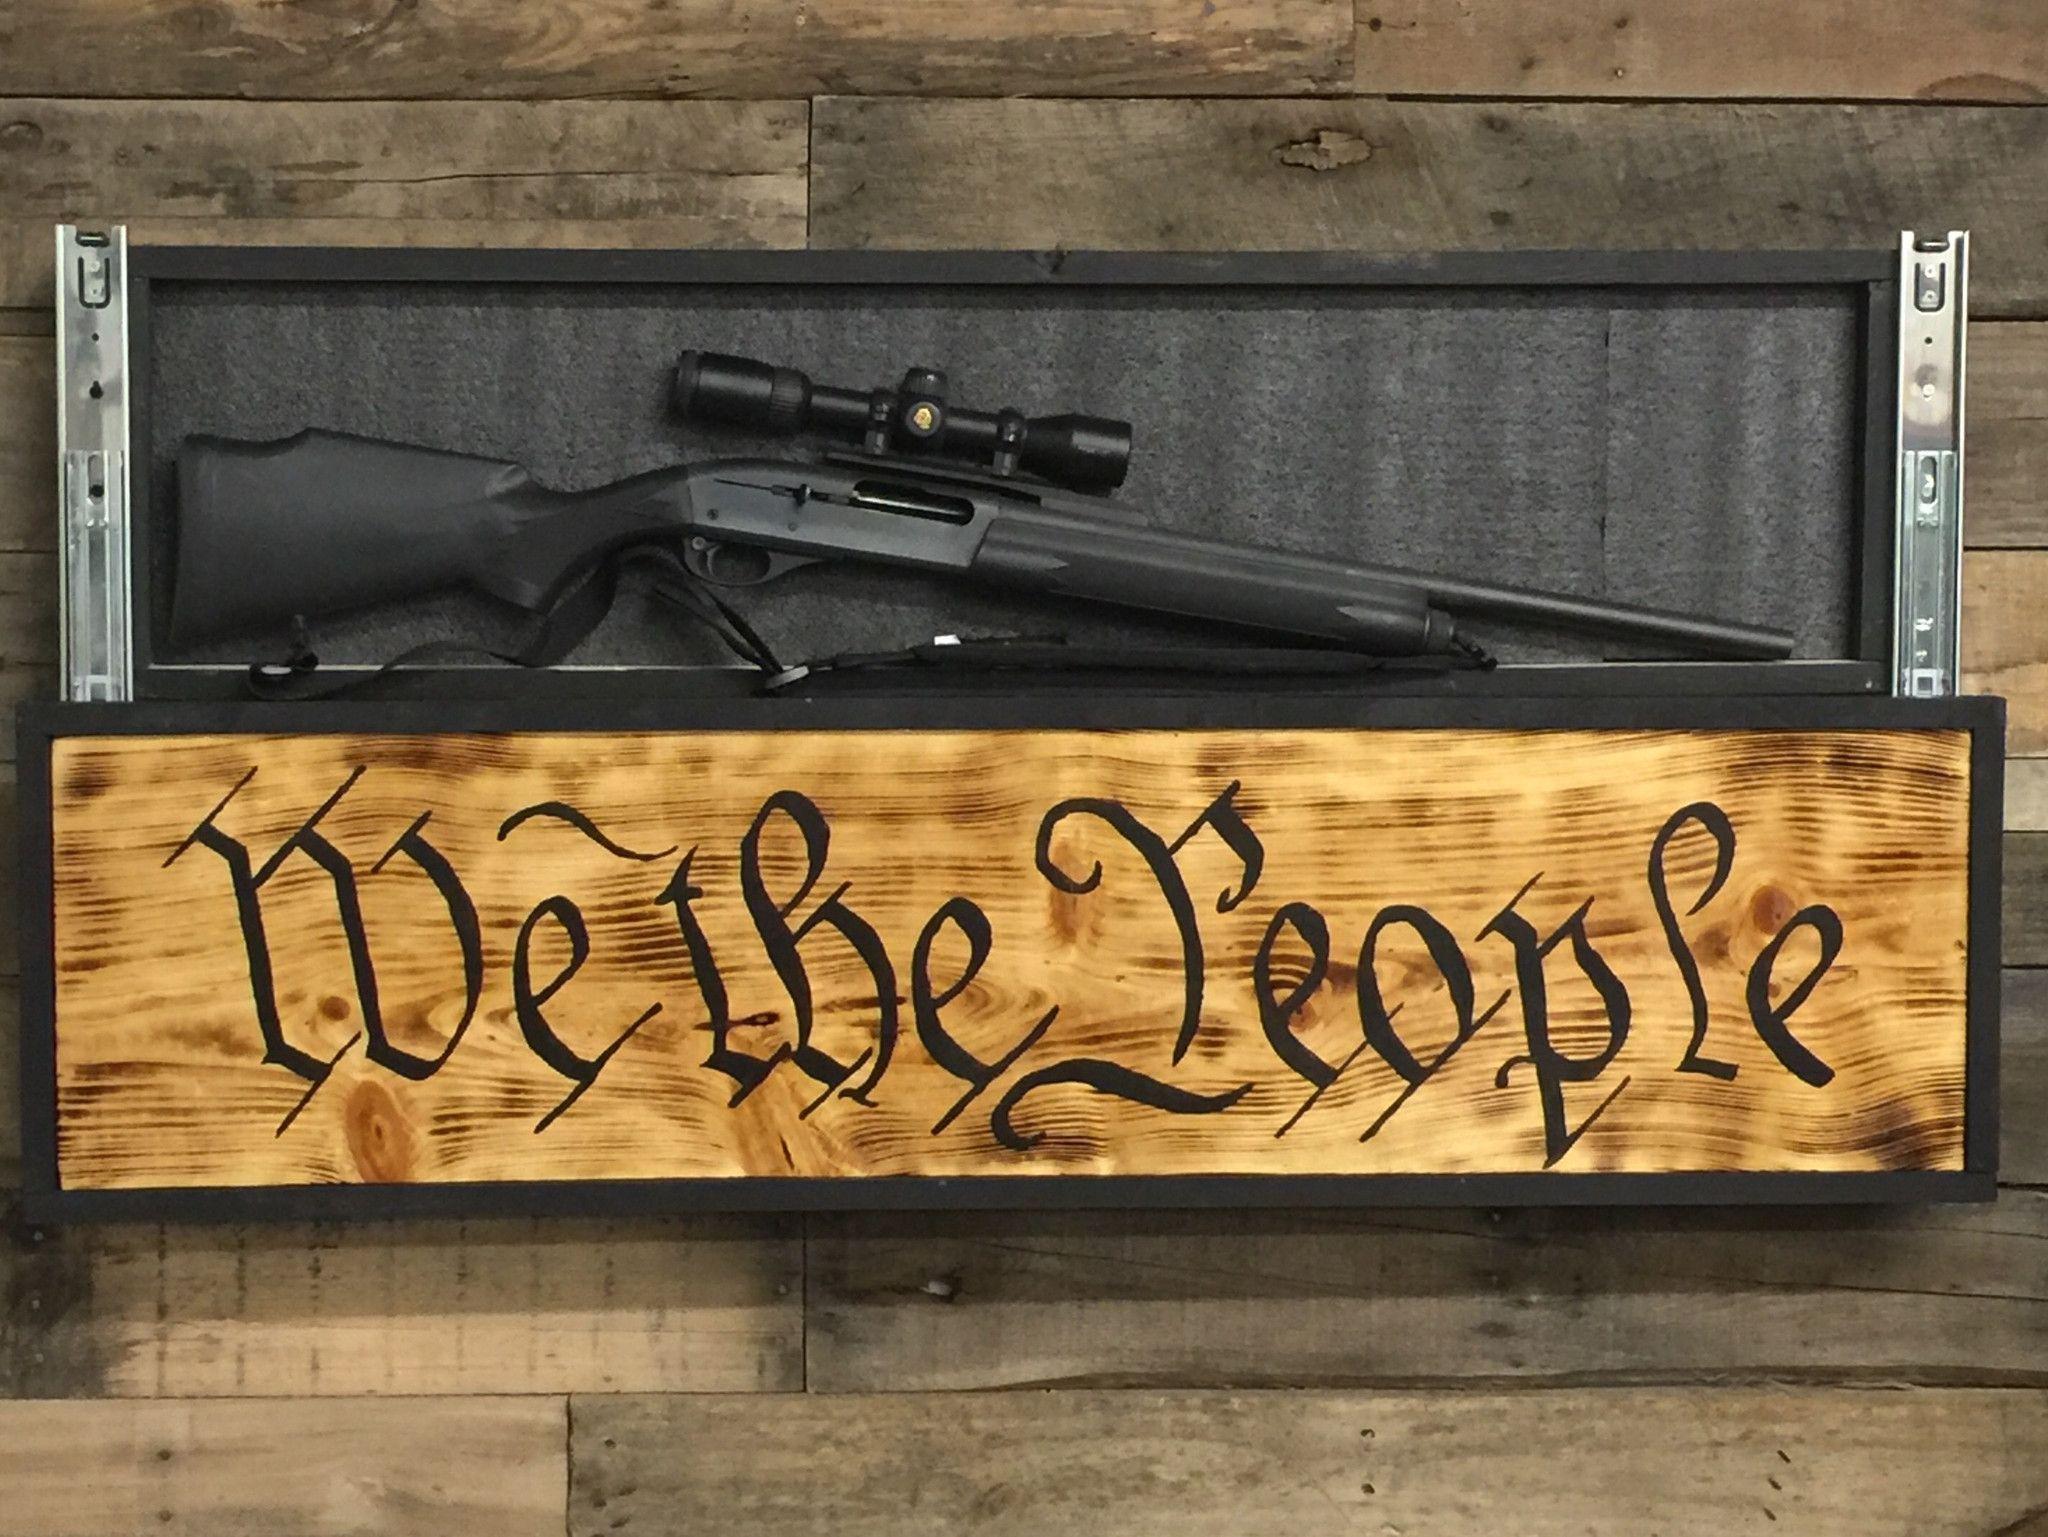 we the people sign with hidden compartment hidden gun